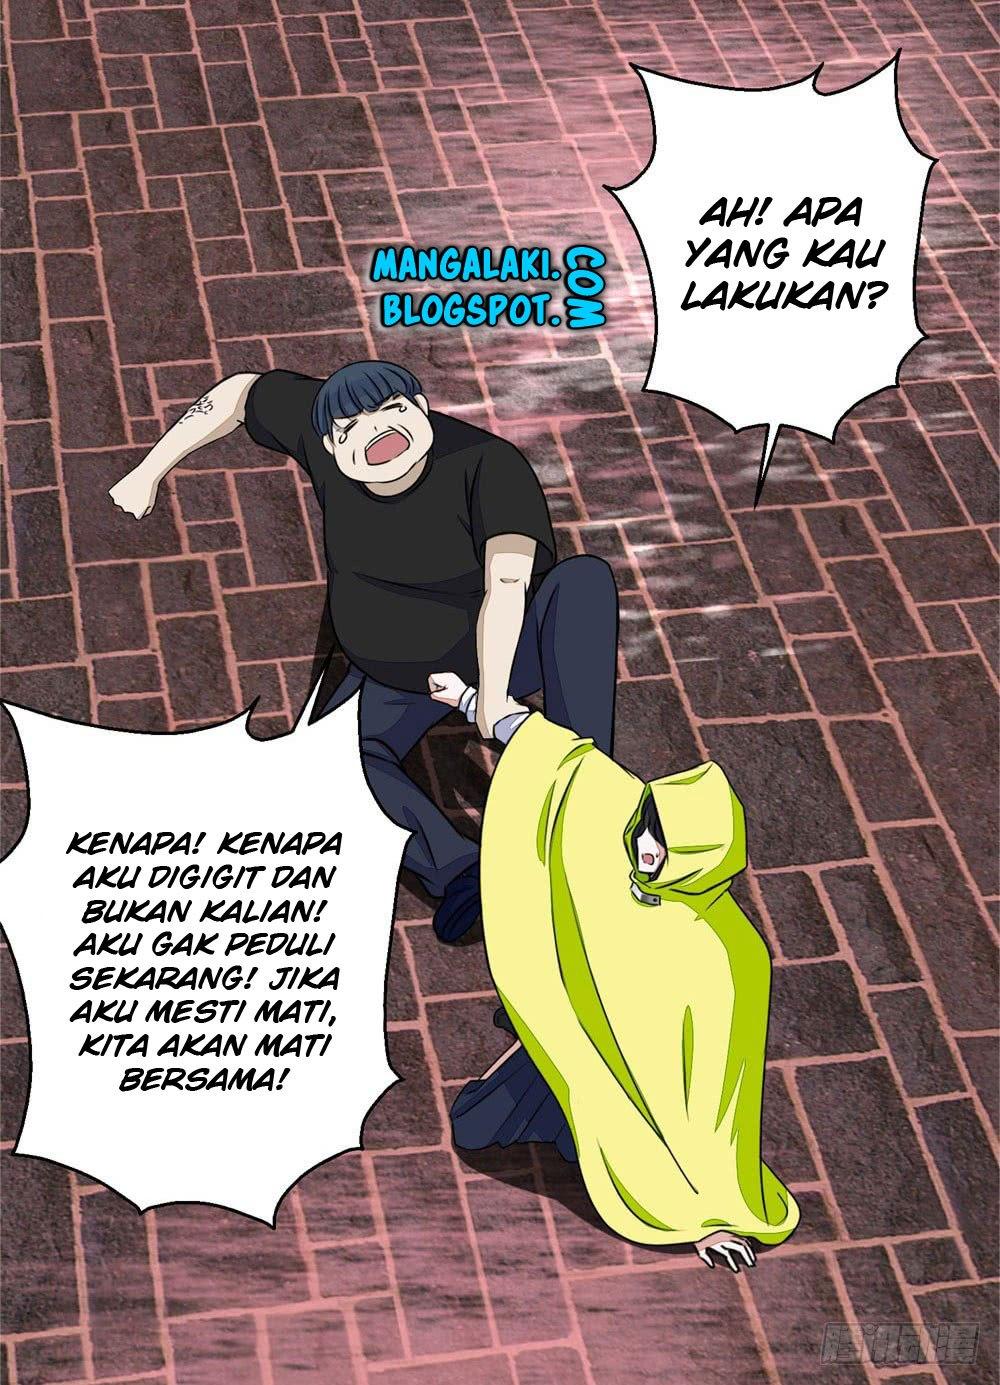 Dilarang COPAS - situs resmi www.mangacanblog.com - Komik king of apocalypse 006 - chapter 6 7 Indonesia king of apocalypse 006 - chapter 6 Terbaru 22|Baca Manga Komik Indonesia|Mangacan